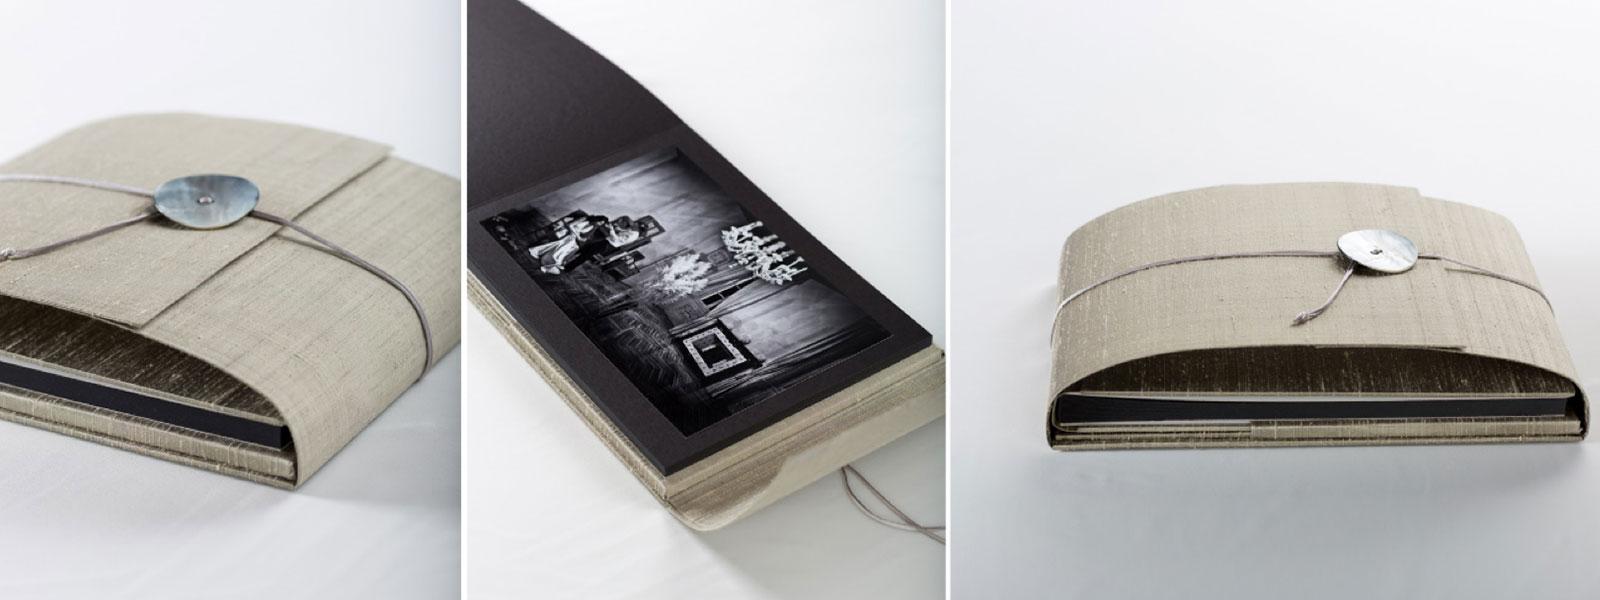 Christian Pedroni Book